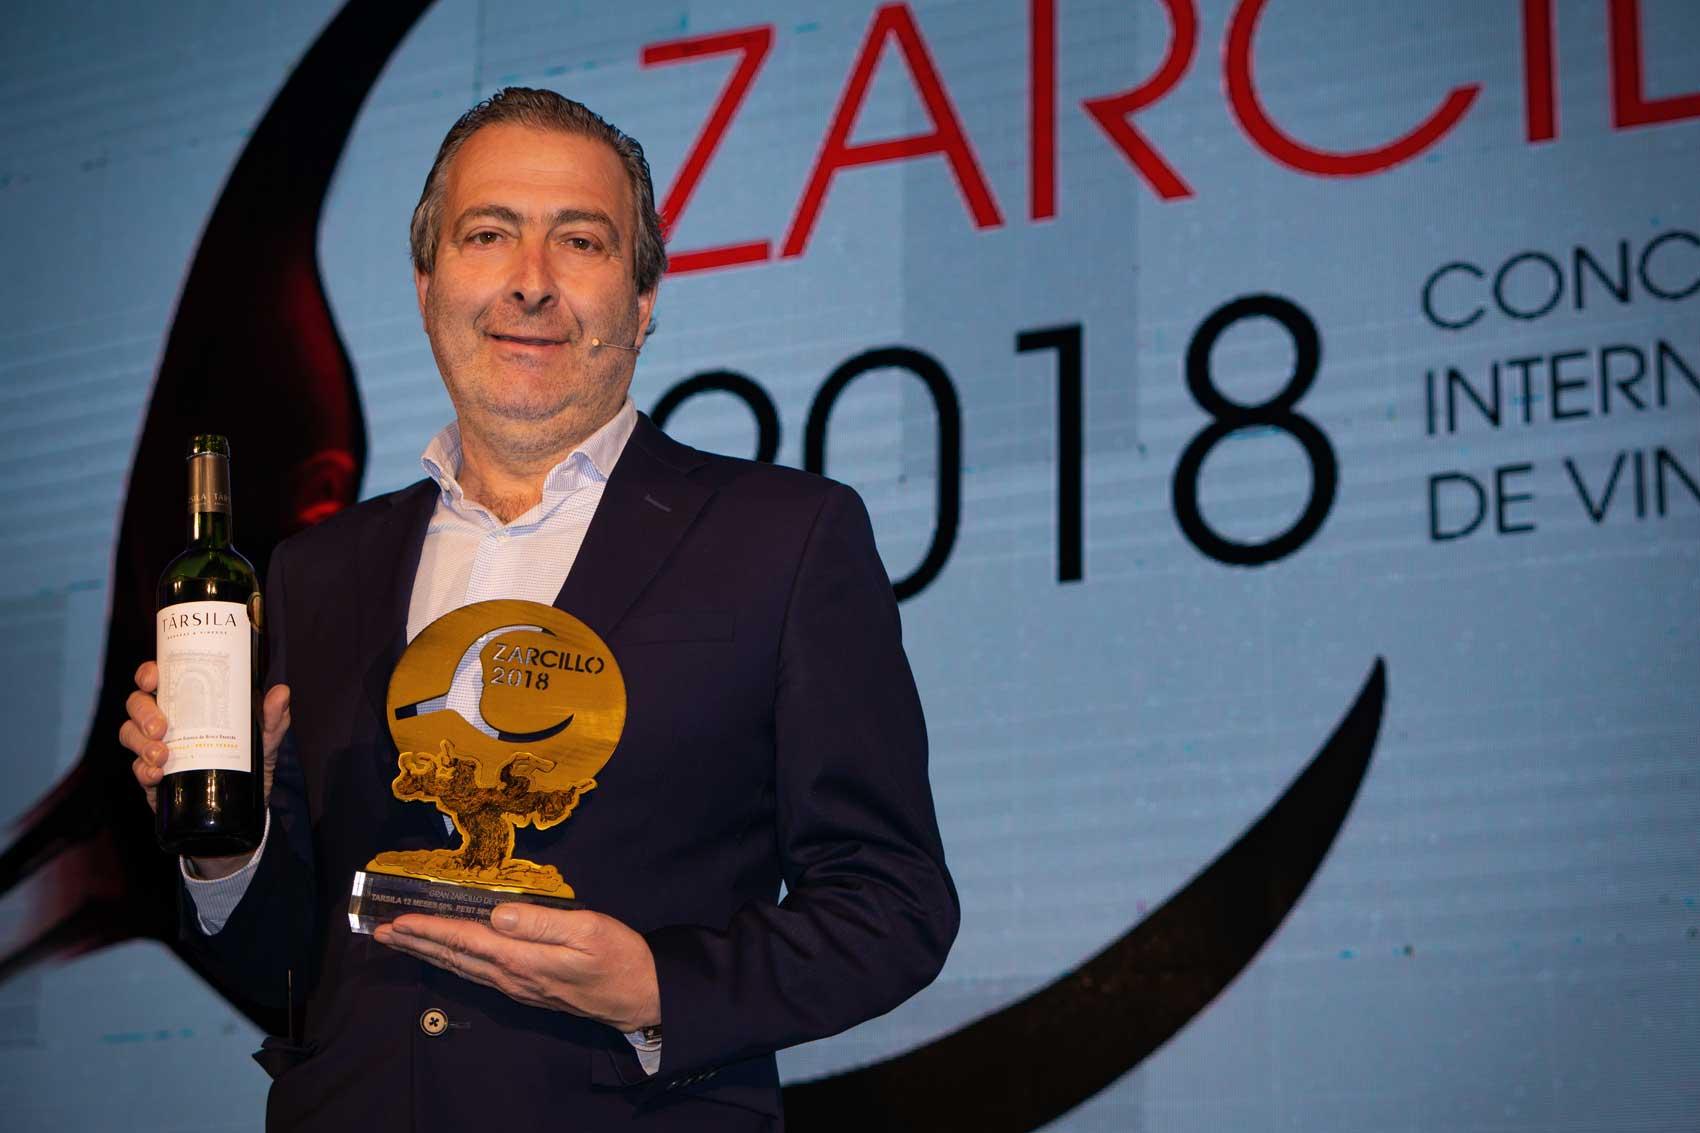 Ricardo Rodilla, Bodegas Társila's General Manager, receives the Great Golden Zarcillo Award at the Santa Espina monastery in Valladolid